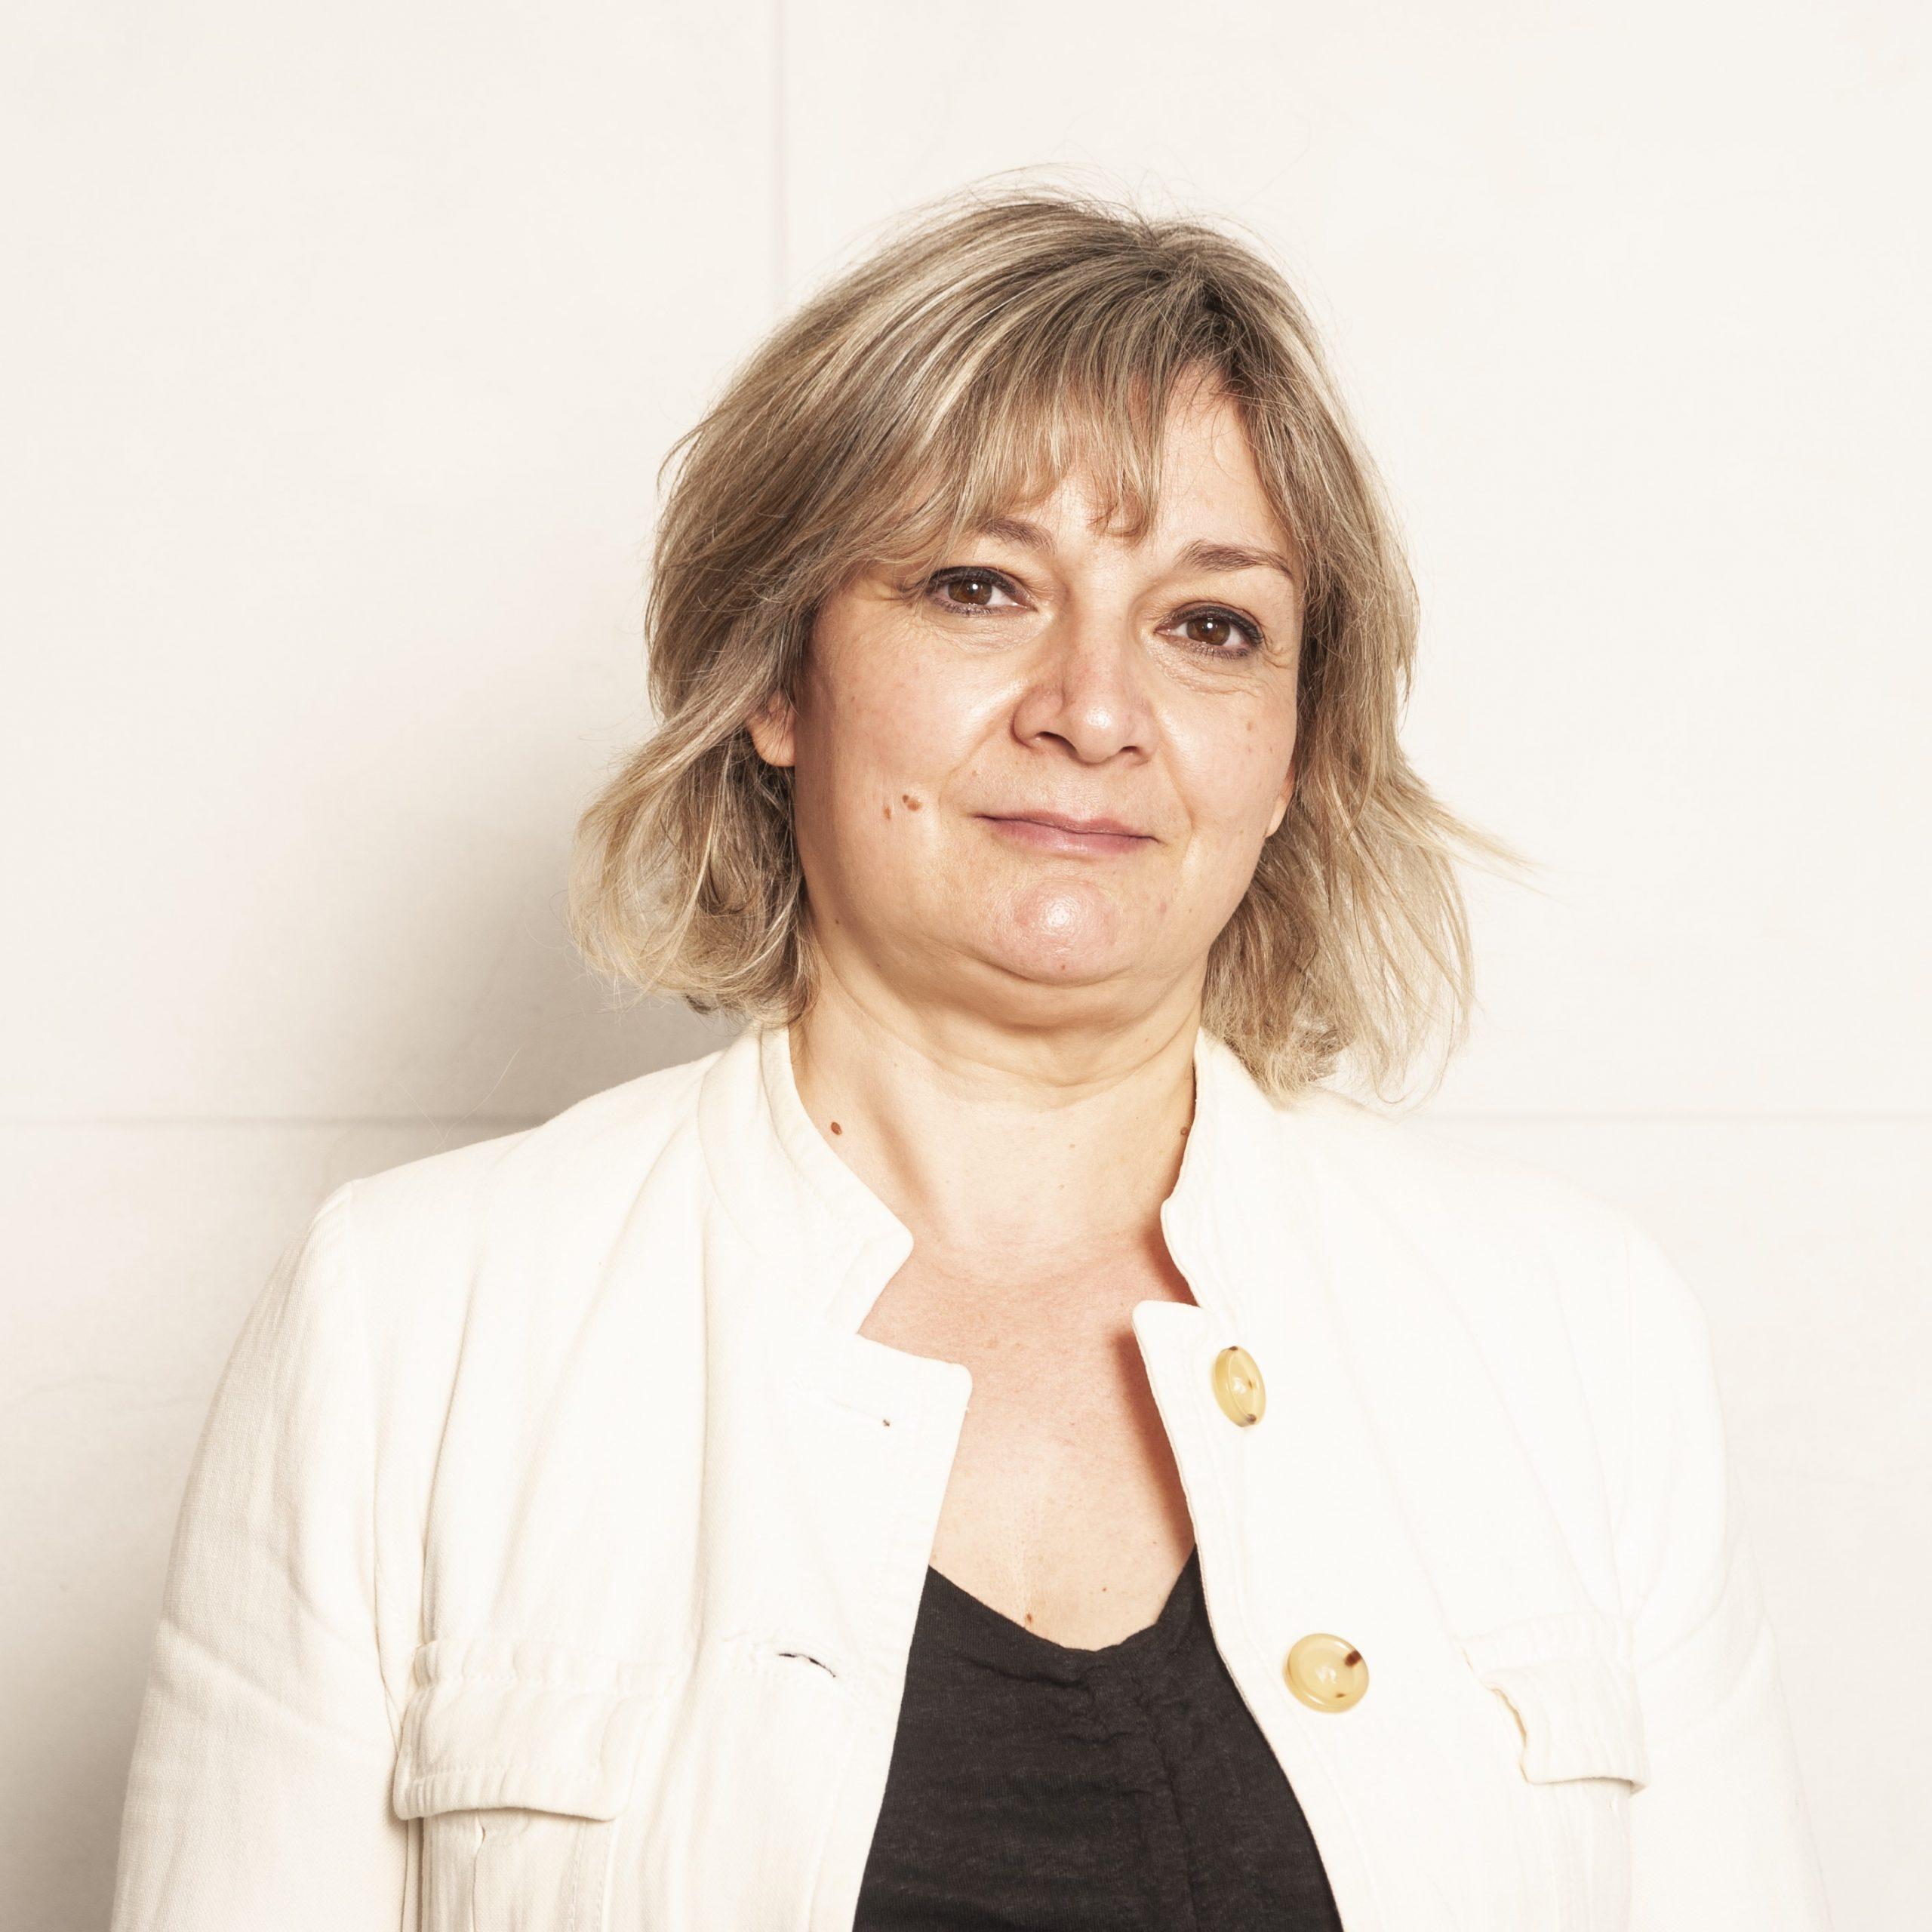 Marce Cancho